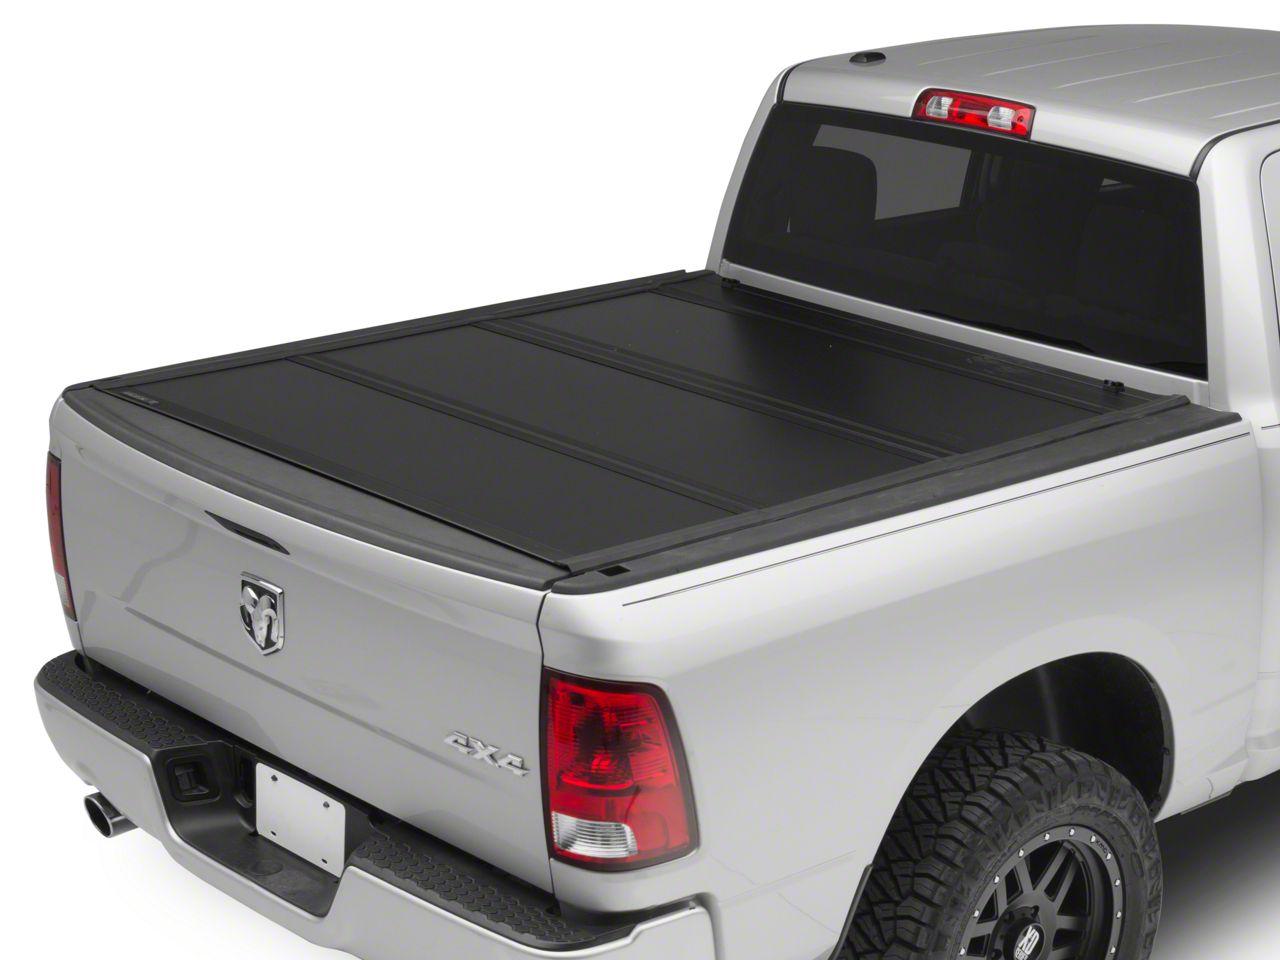 UnderCover Ultra Flex Tri-Fold Tonneau Cover - Black Textured (02-18 RAM 1500 w/ 5.7 ft. & 6.4 ft. Box & w/o RAM Box)